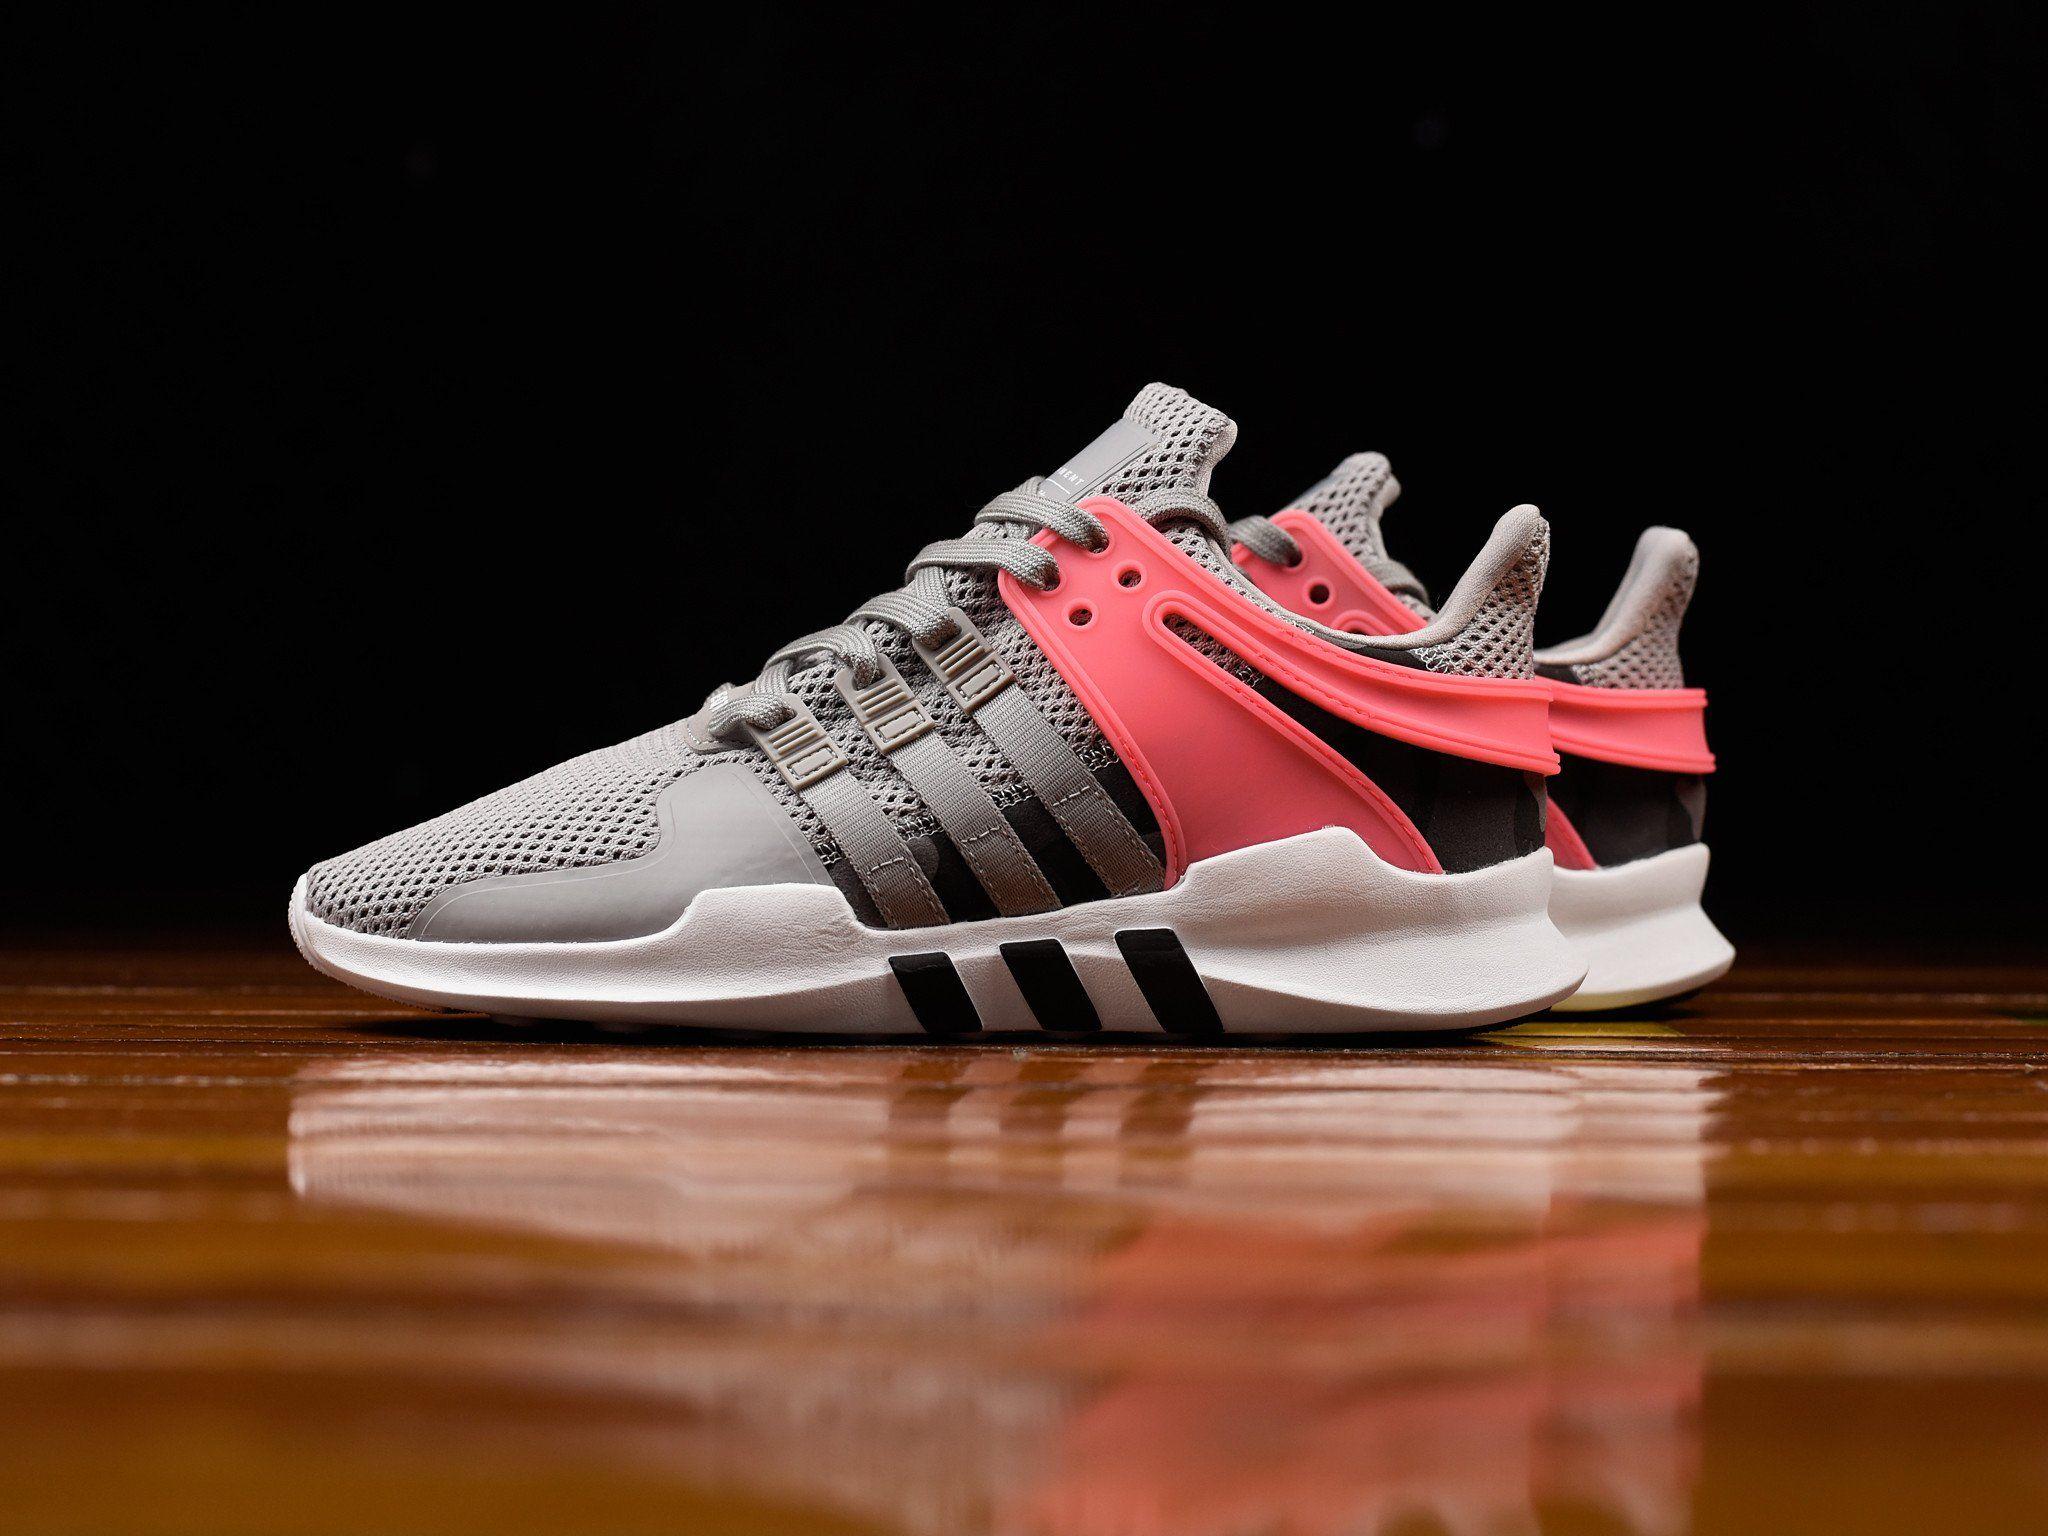 Men's Adidas EQT Support ADV 'Black Camo' [BB2792] | Adidas